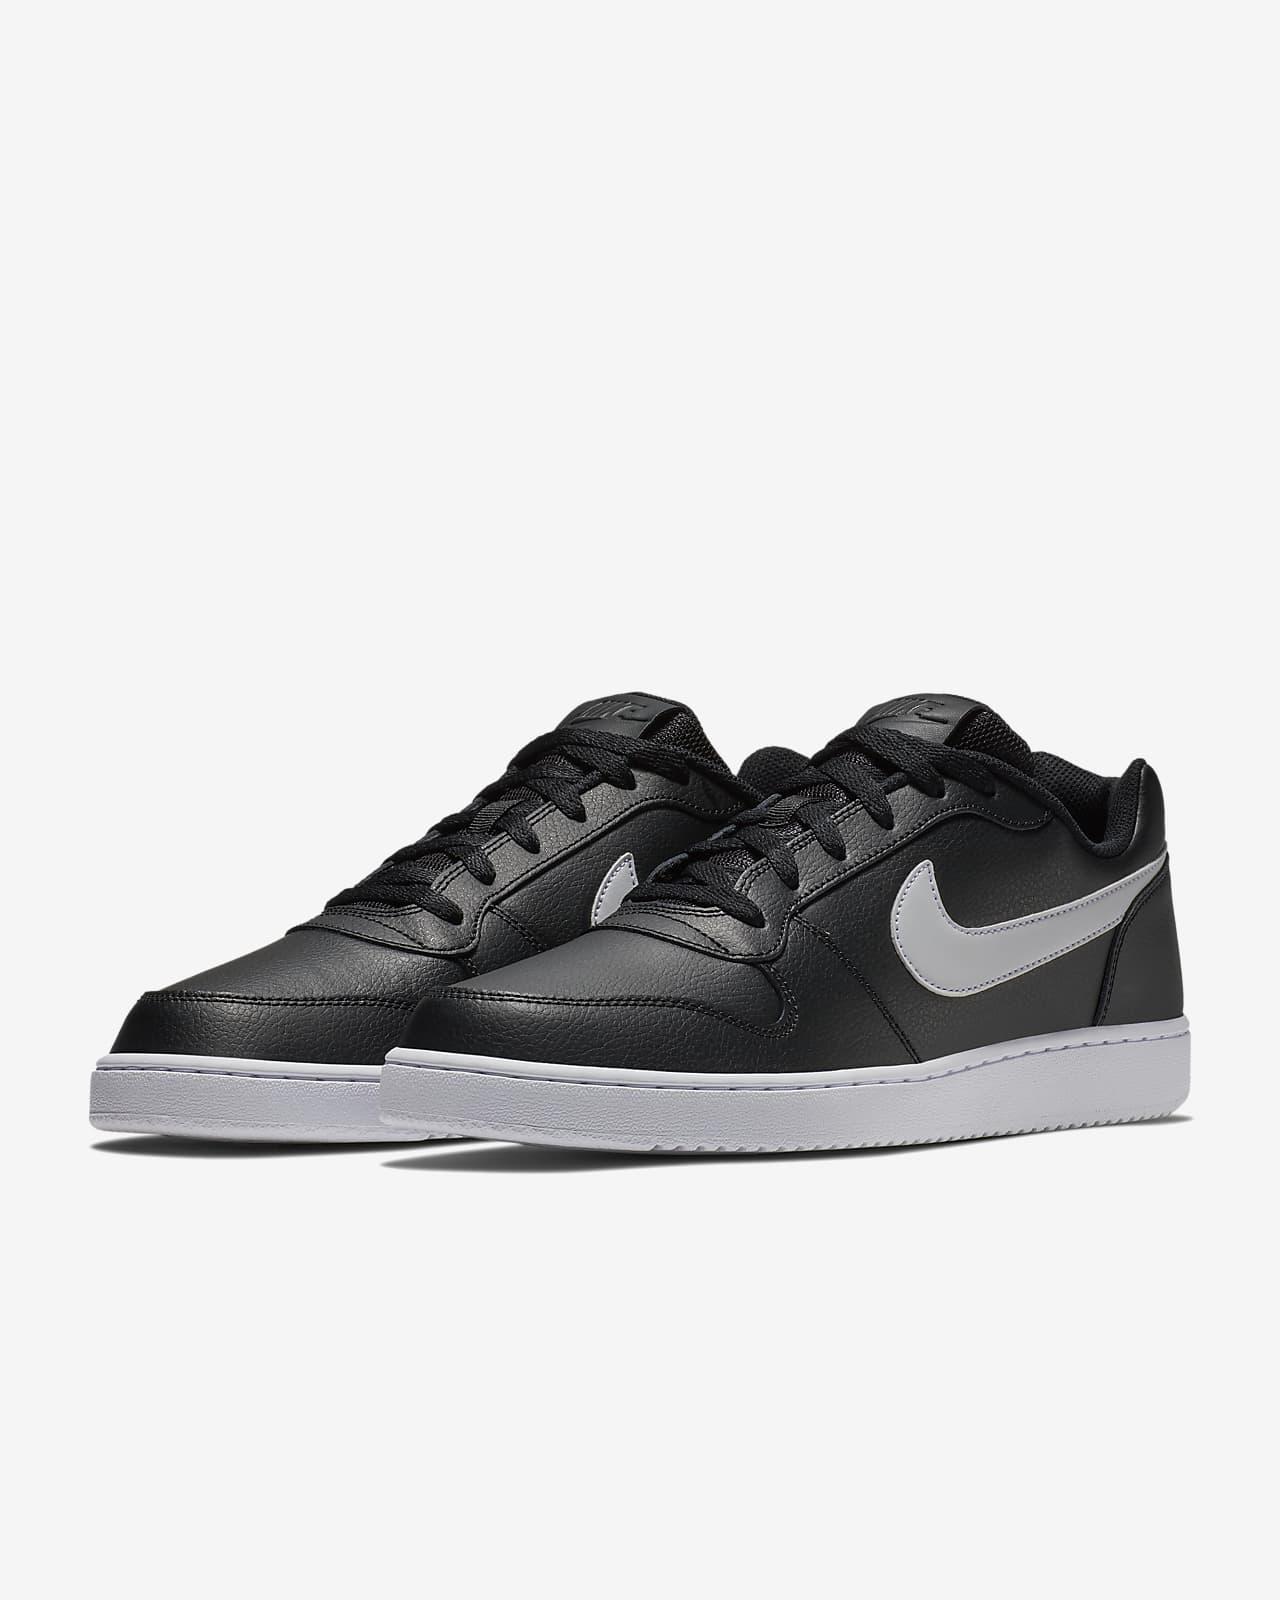 Hueco Terapia personal  Nike Ebernon Low Men's Shoe. Nike CA